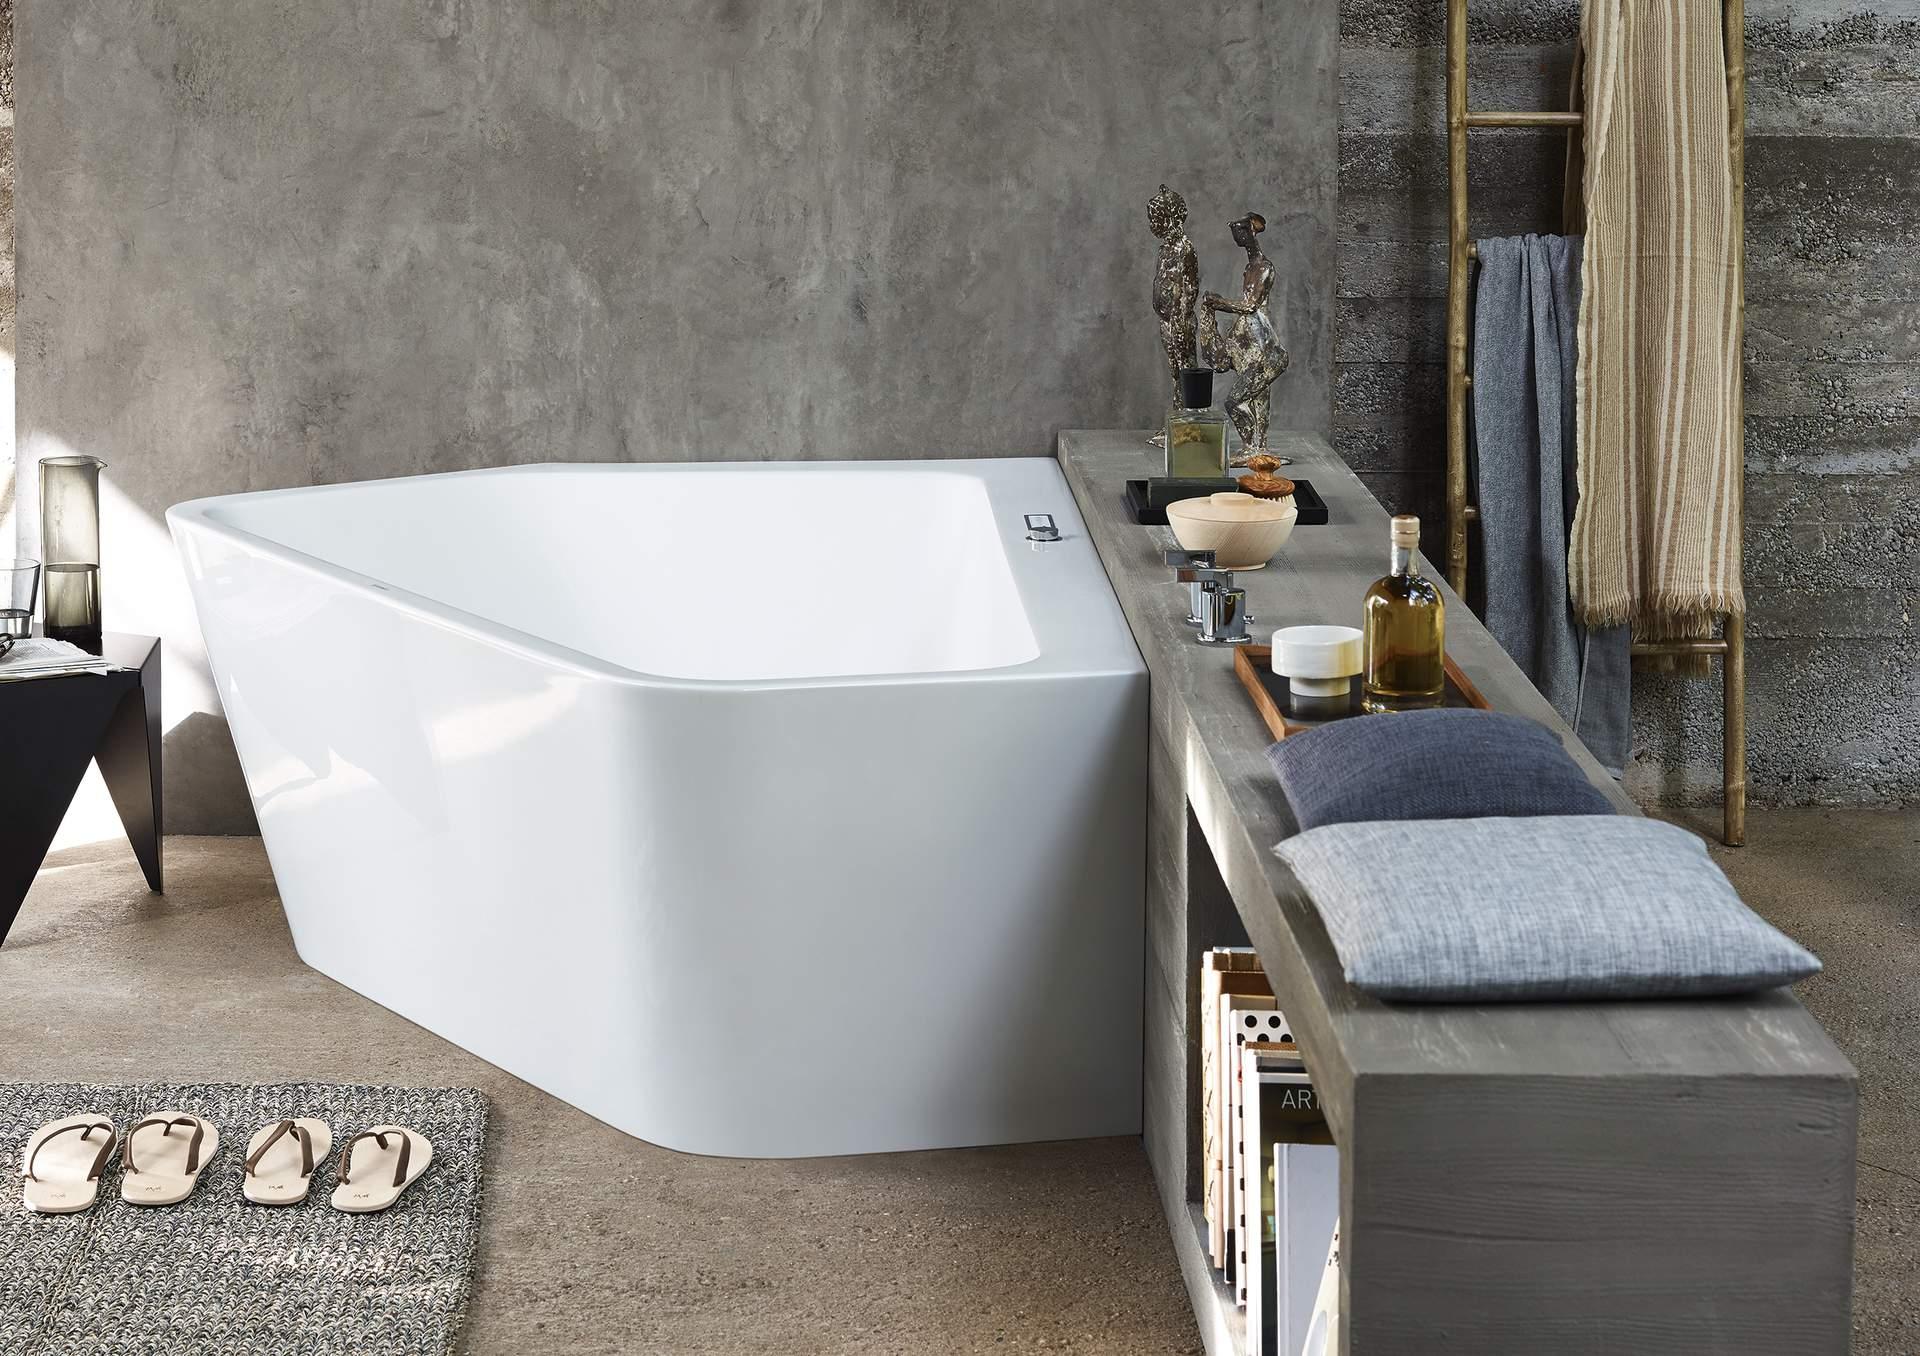 Duravit Paiova 5 Newest Addition To The Bathtub Family